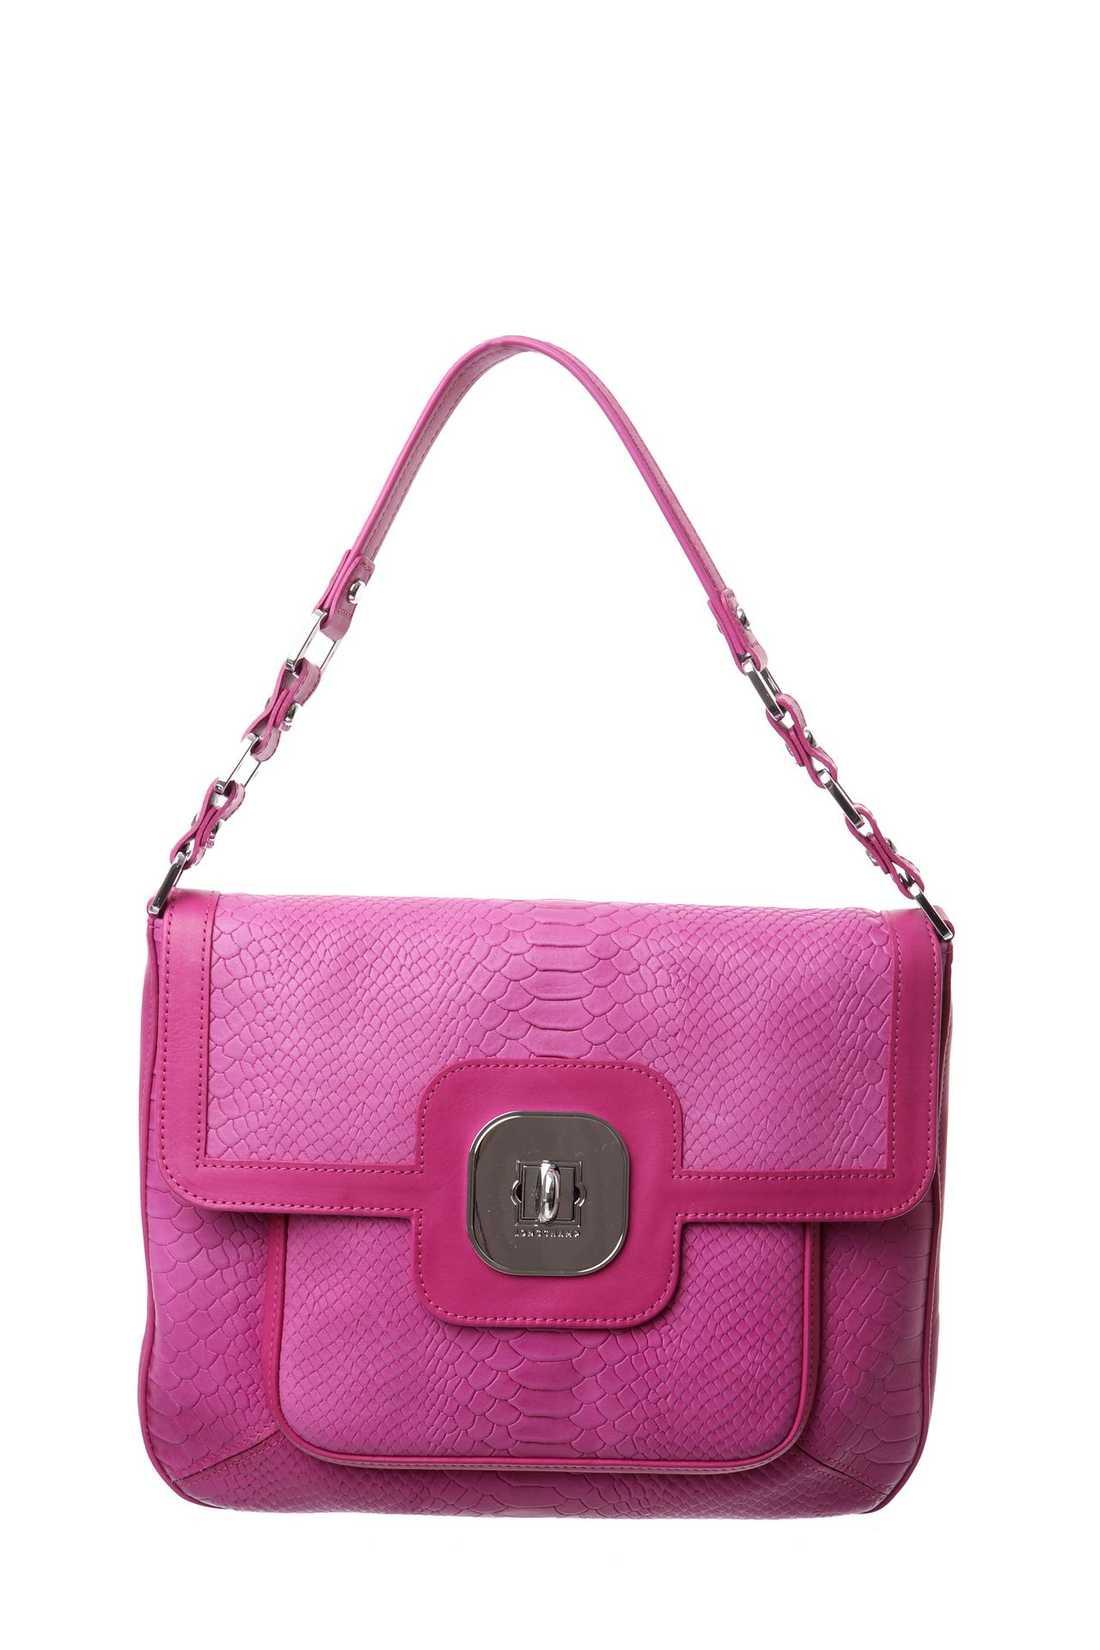 Longchamp, 6239 kr.